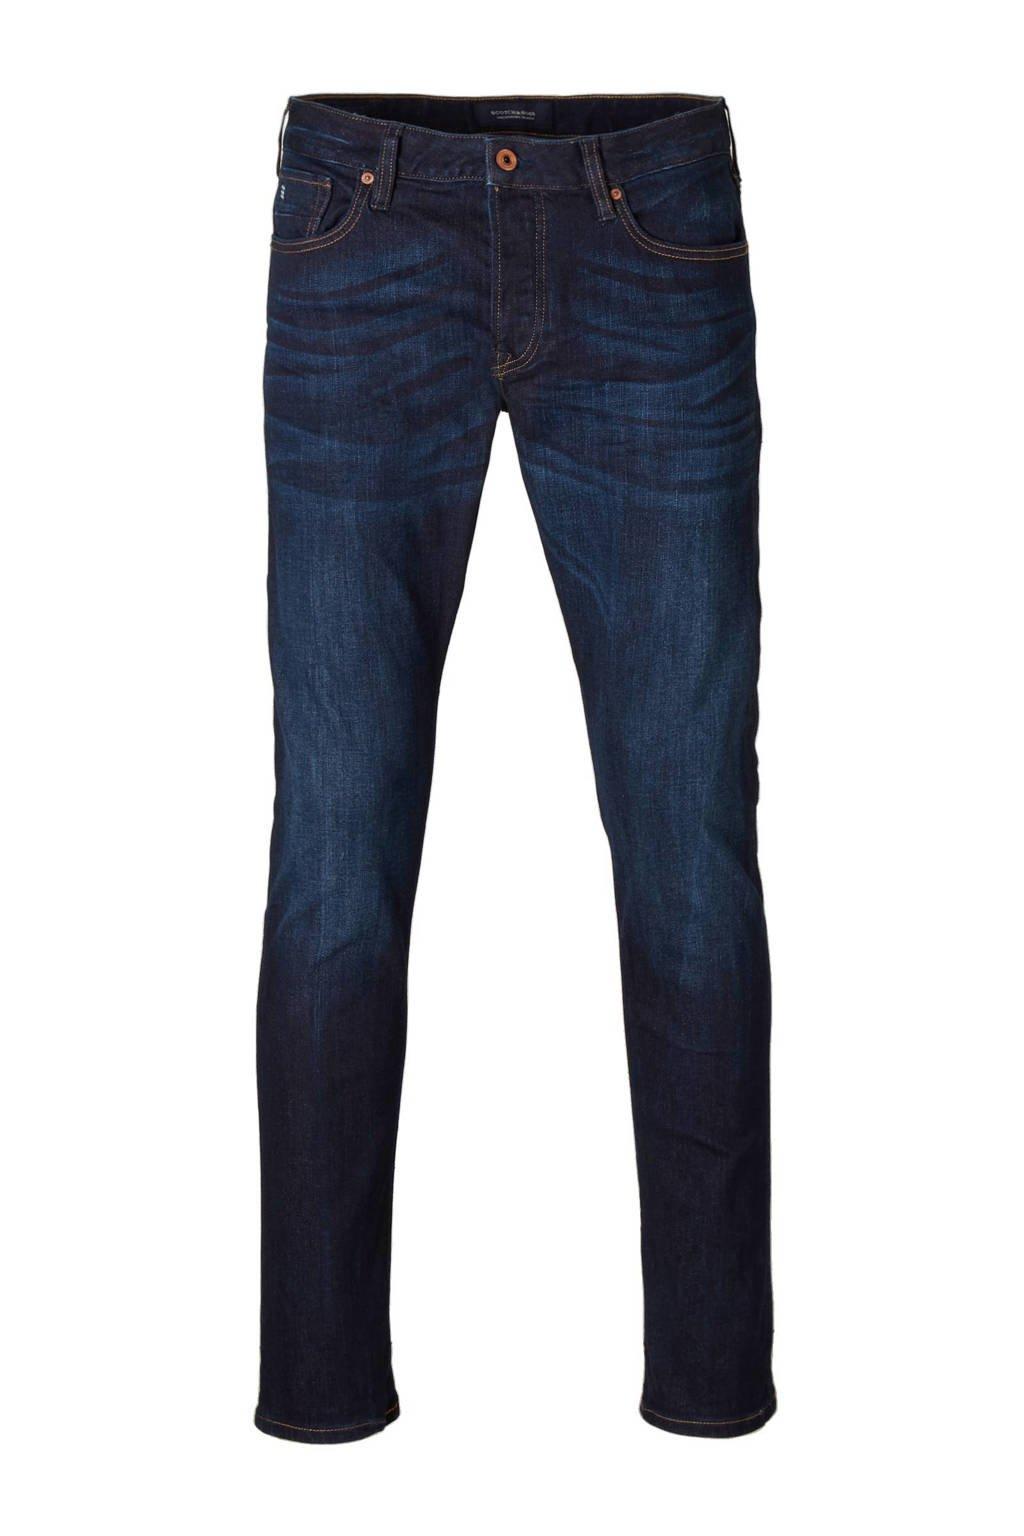 Scotch & Soda slim fit jeans Ralston beaten back, 1841 Beaten Back